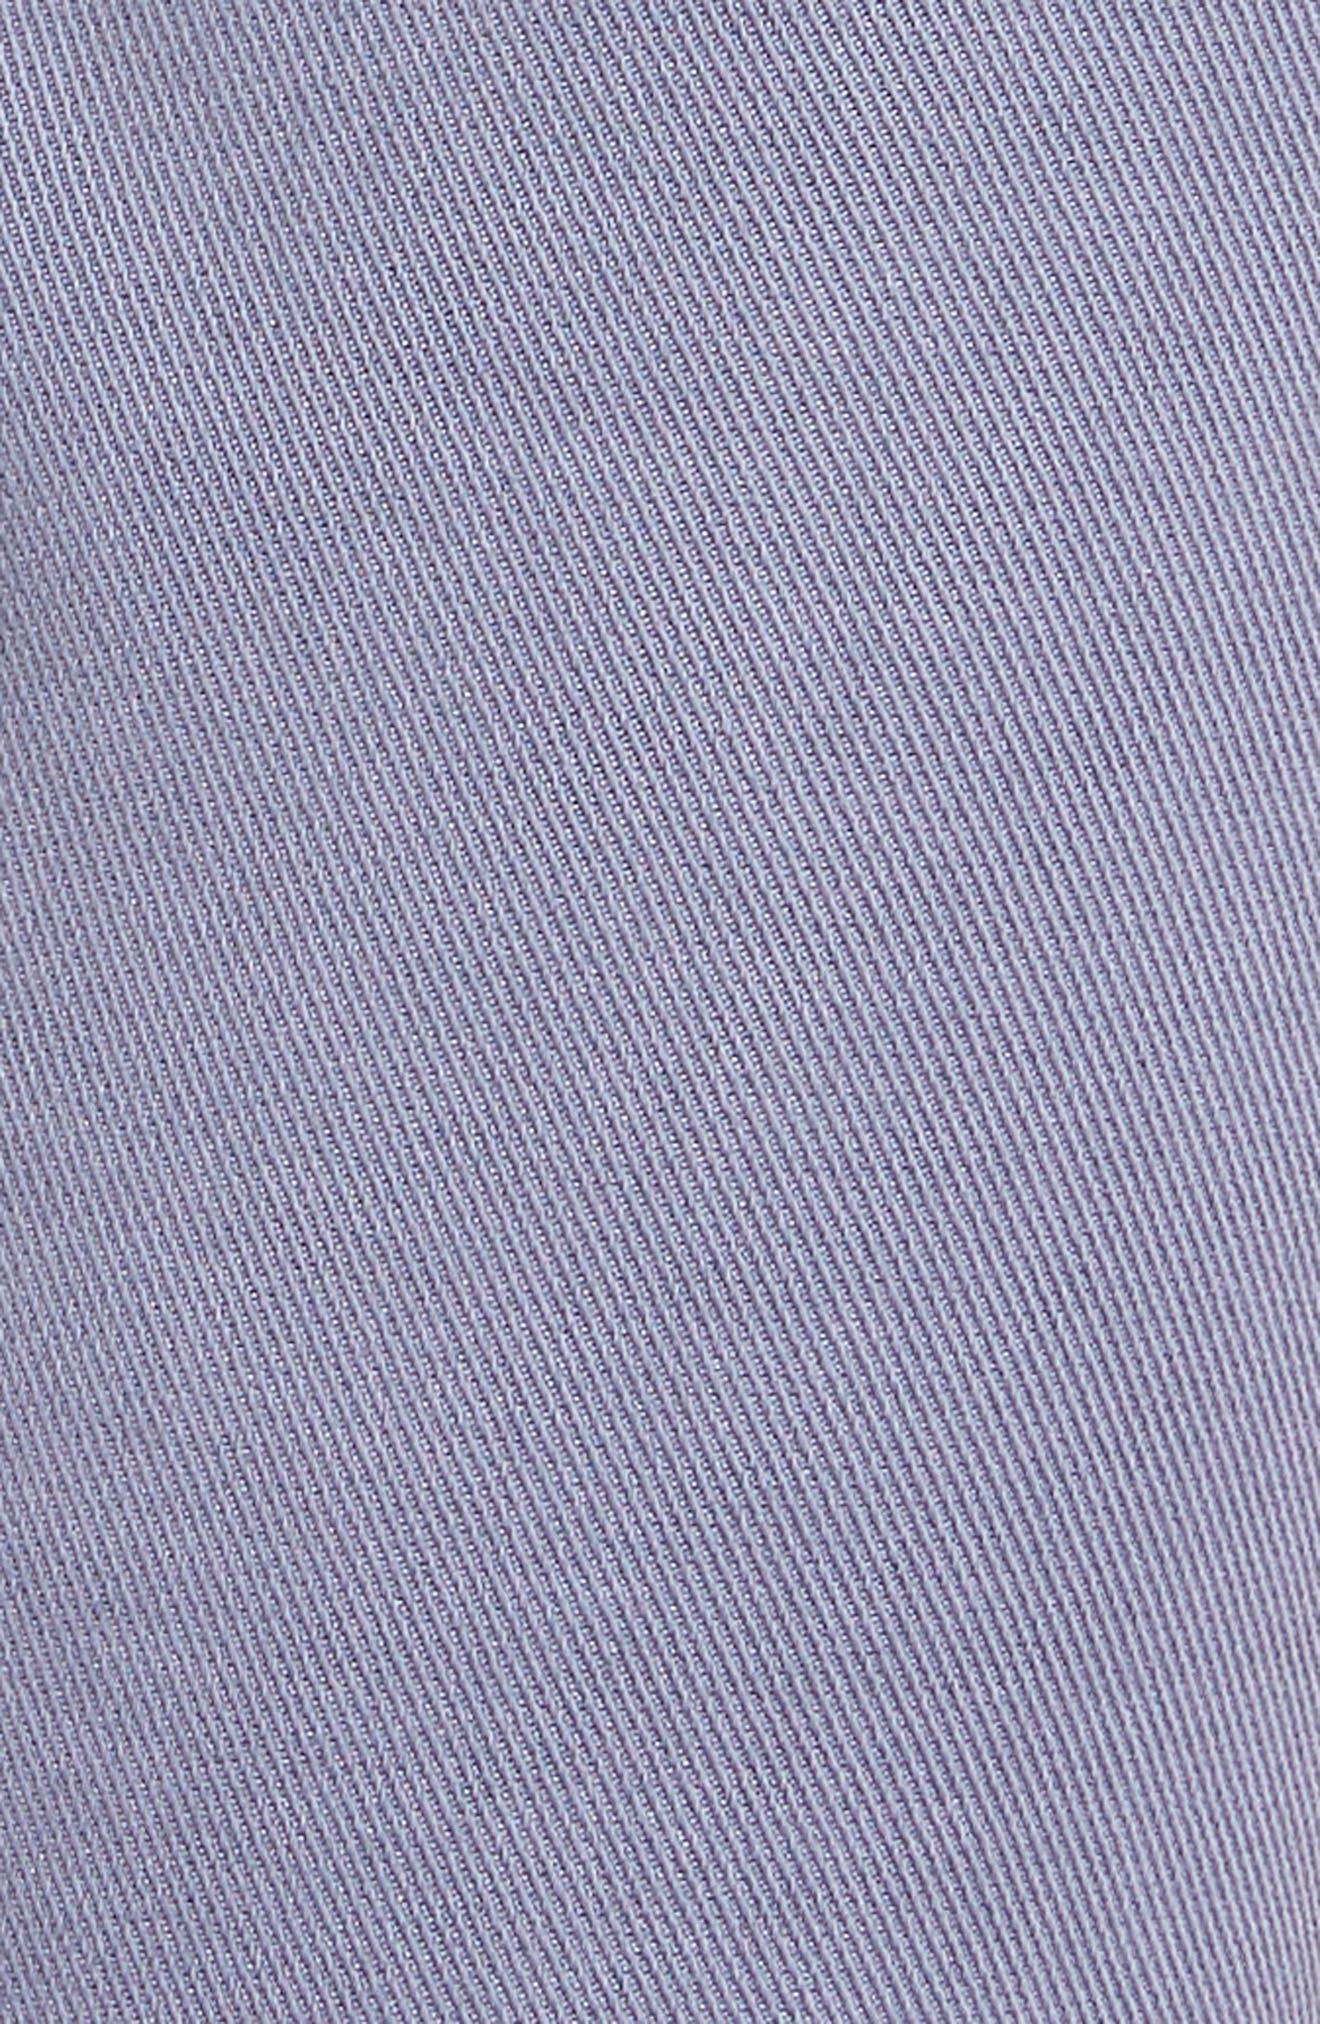 Modern Utility Pants,                             Alternate thumbnail 6, color,                             Indigo Wash